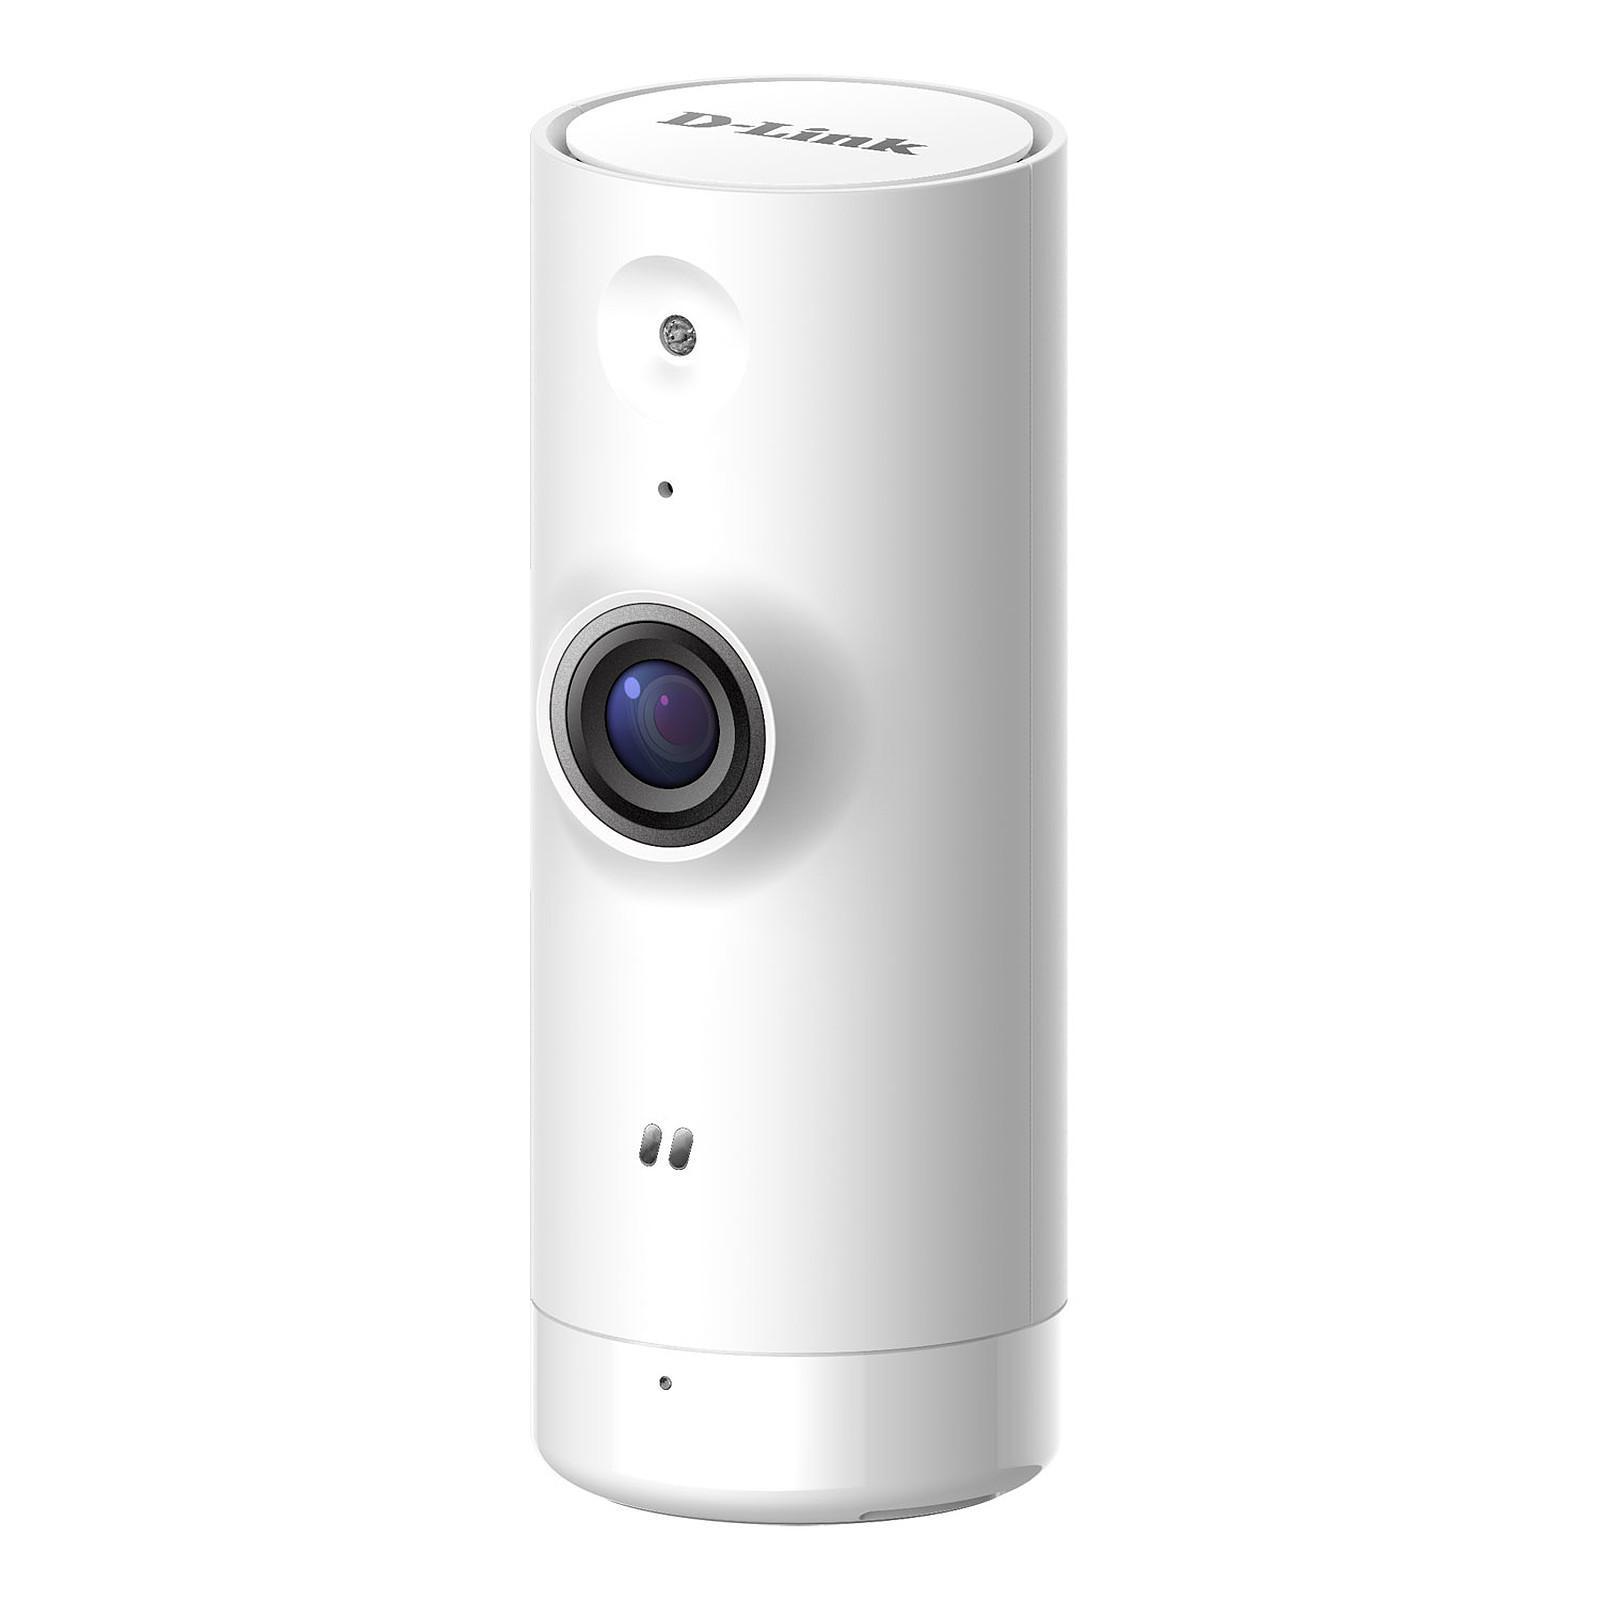 Caméra D-Link DCS-8000LH - Blanc